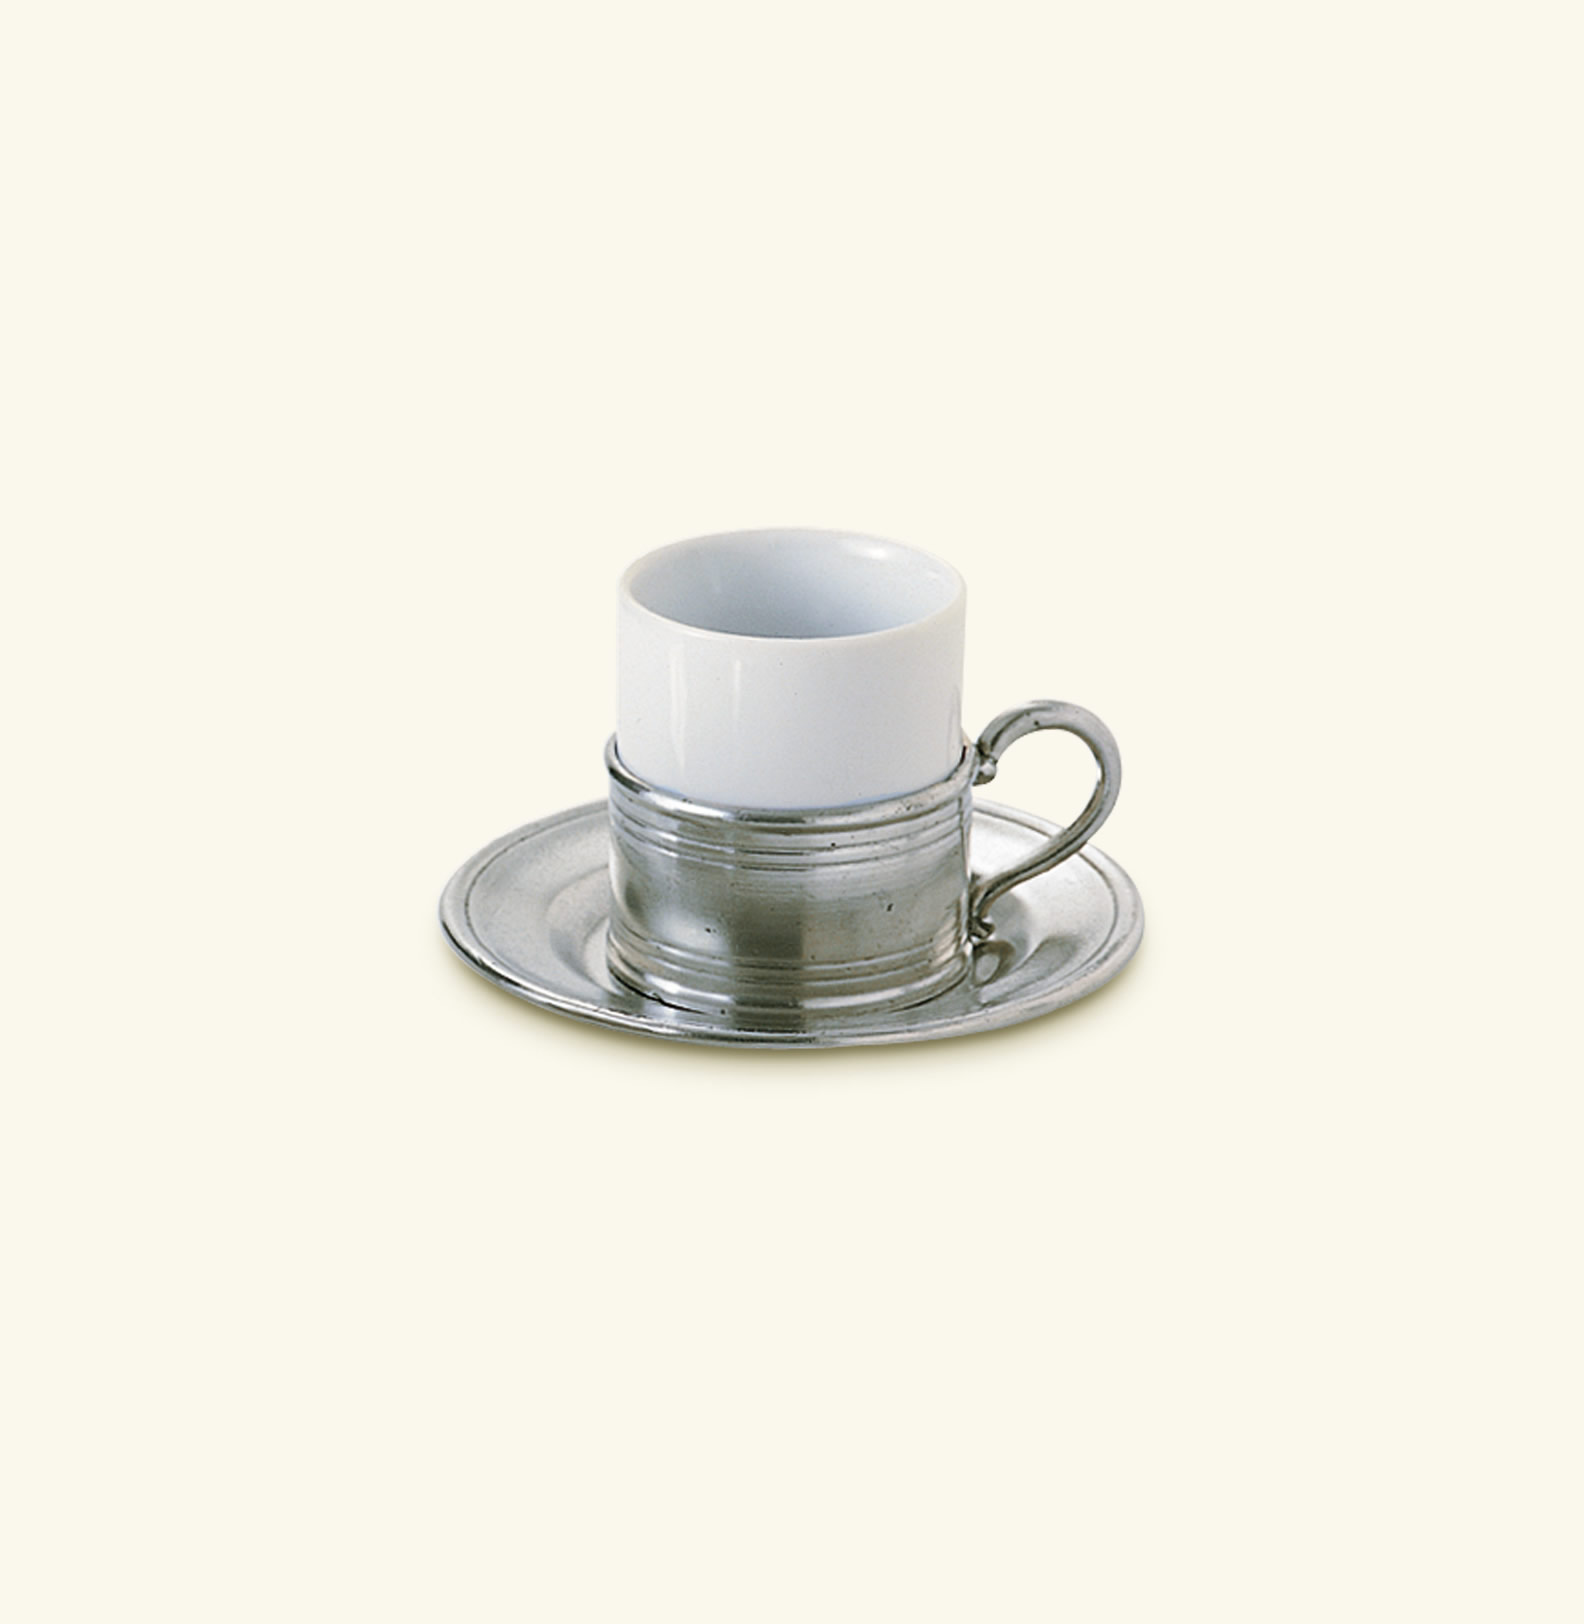 match-espresso-cup-with-saucer-2.7-oz-710.0.jpg